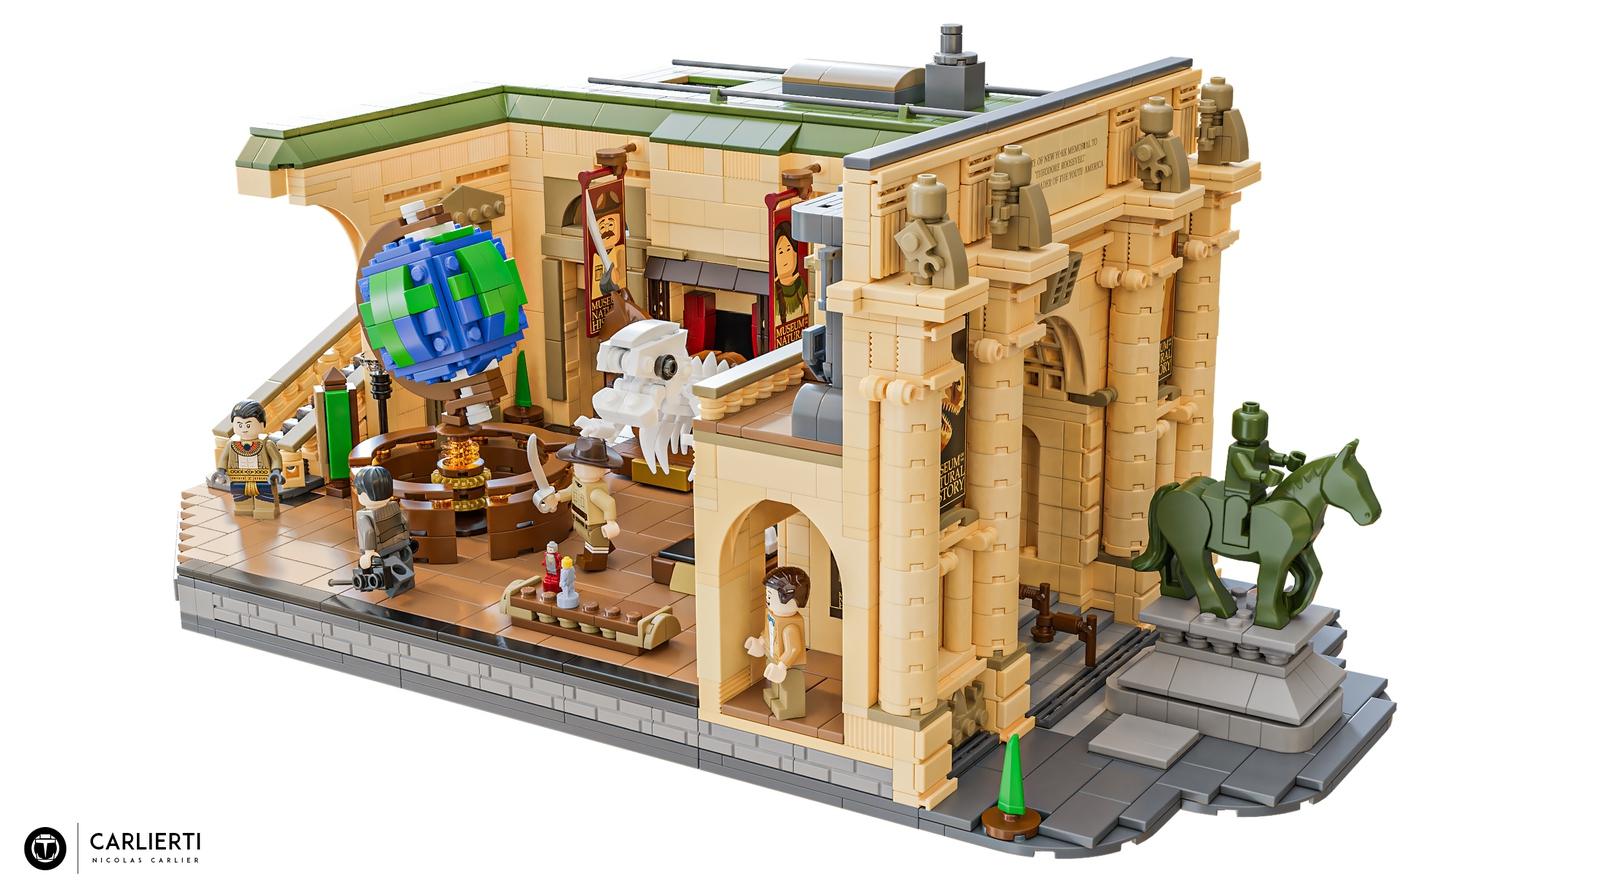 lego-ideas-night-at-the-museum-carlieri-4 zusammengebaut.com